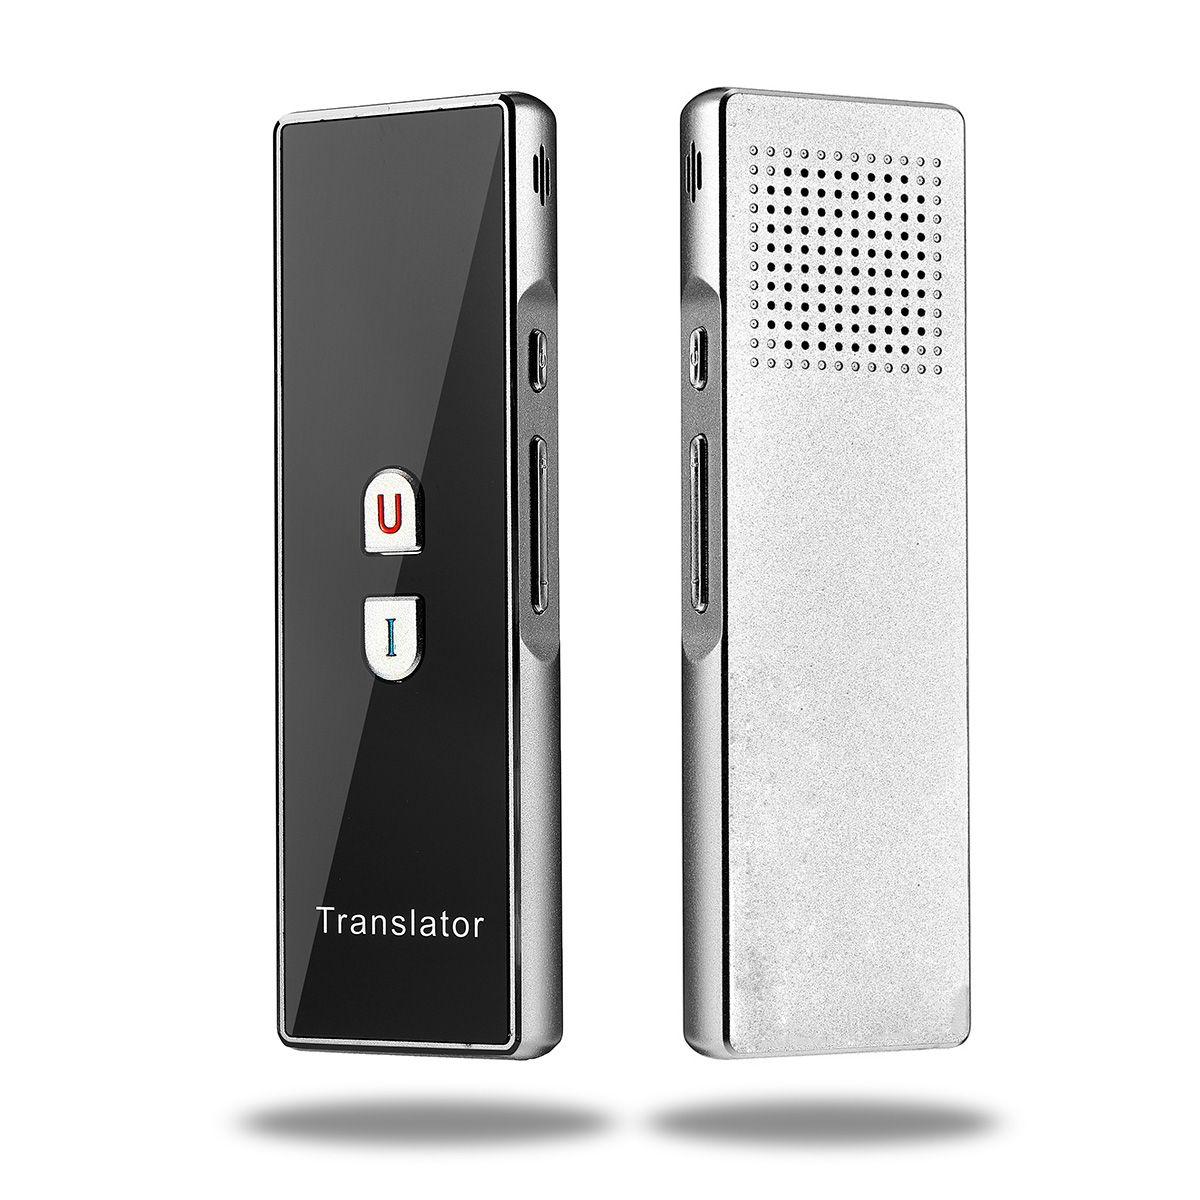 Portable Smart Voice Translator Real Time 40 Languages Translation Instant Bluetooth Traductor Translator Learning Business